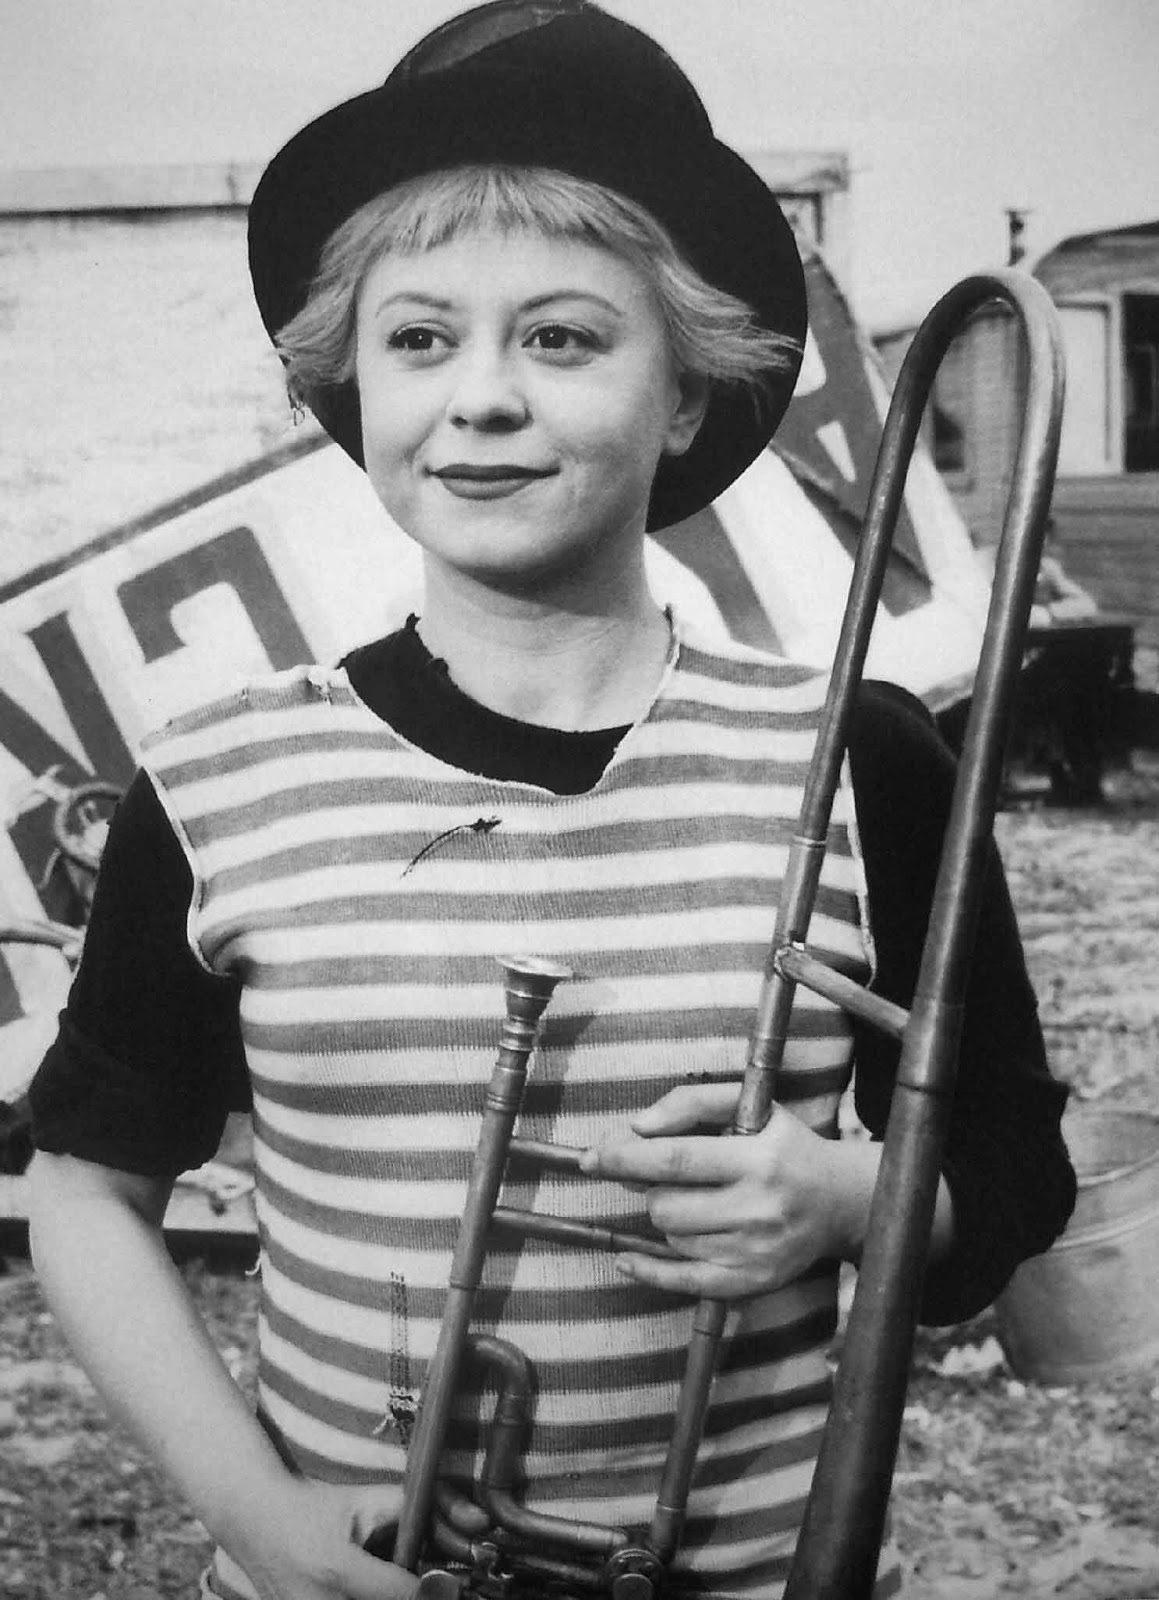 La Strada Fellini